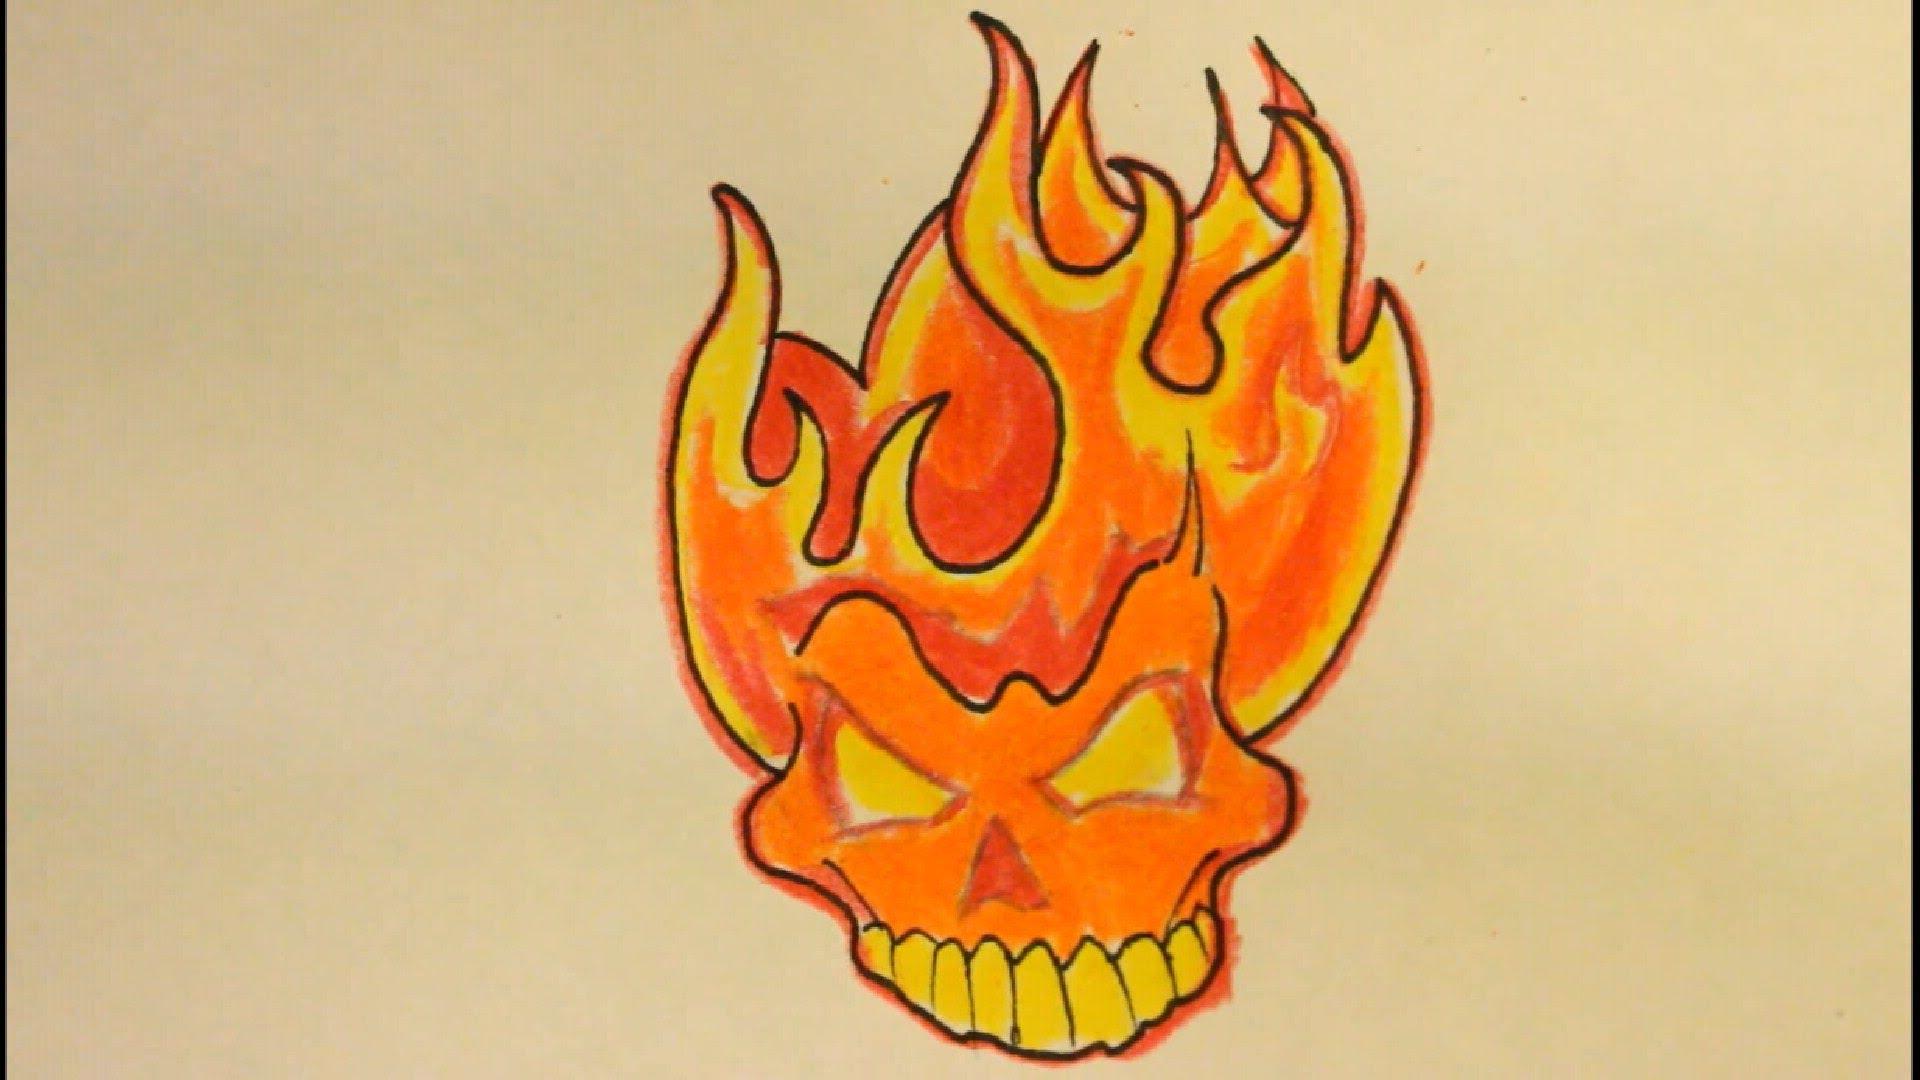 Drawn skull on fire Flames Fire Fire Skull Beginners